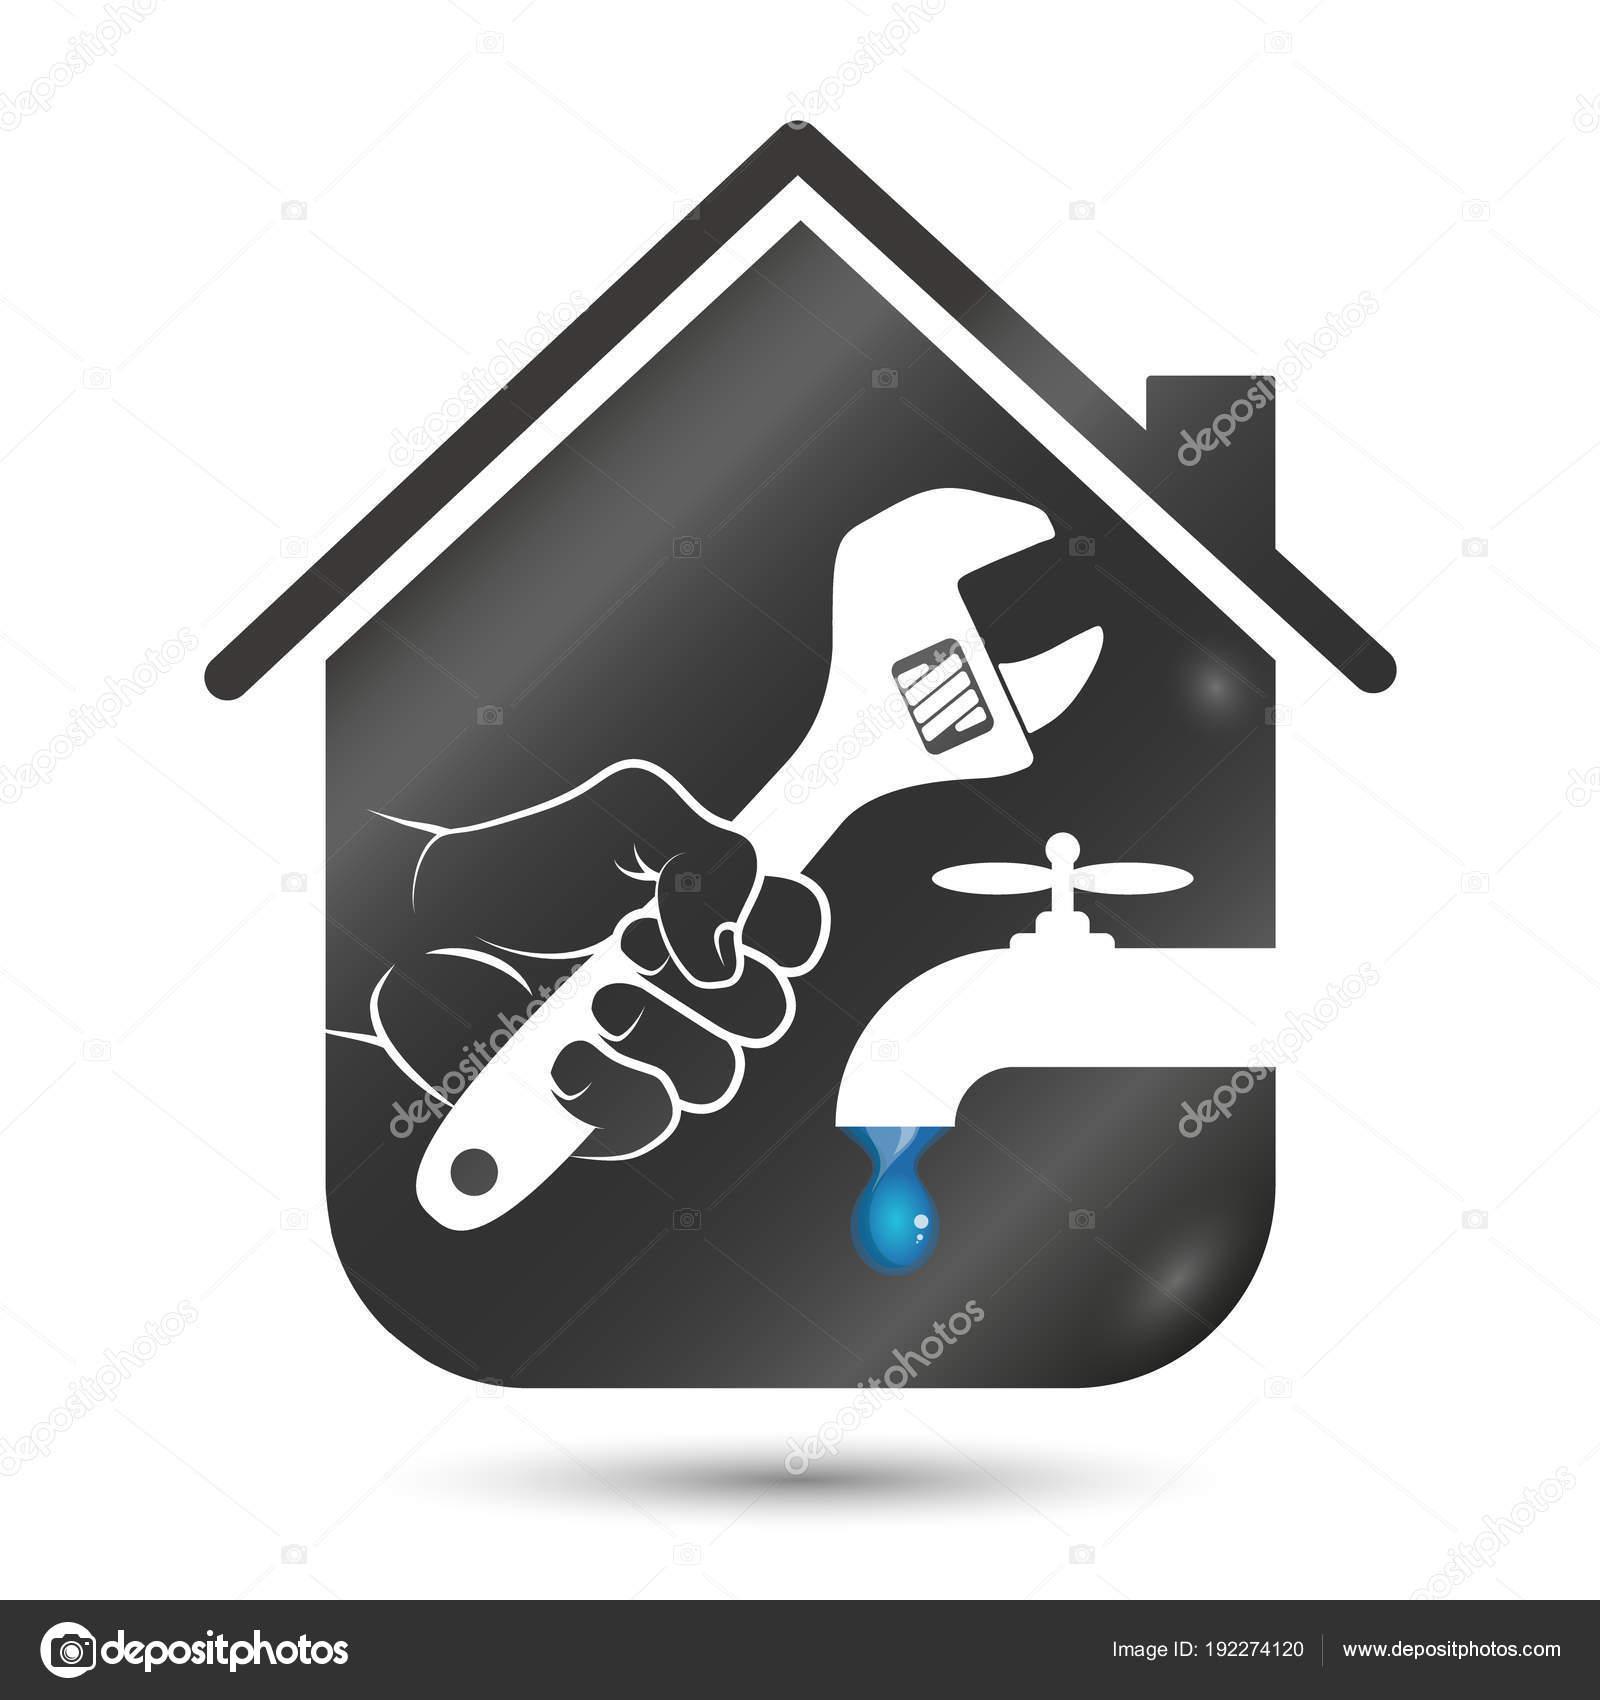 Repair Plumbing Or Running Water In The House Stock Vector